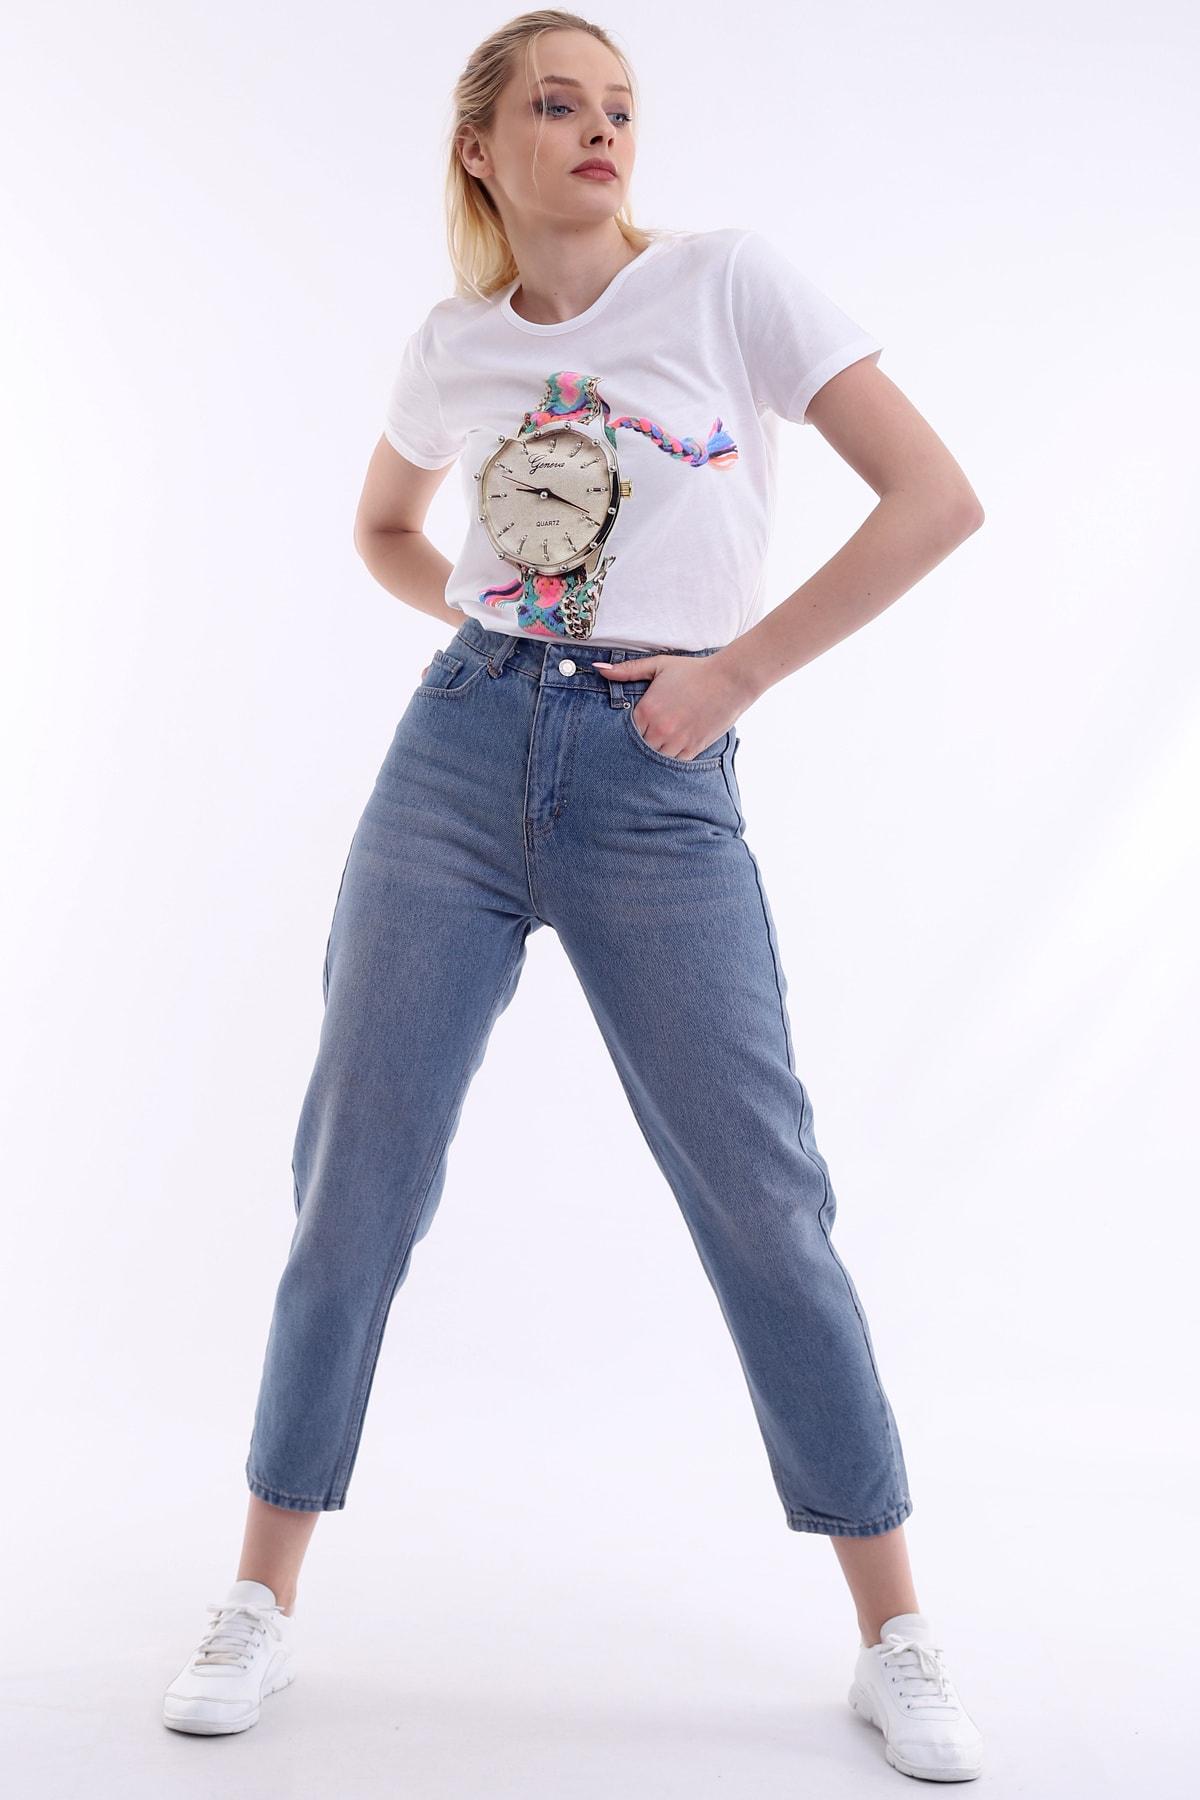 Özel Tasarım, Yüksek Bel, Rahat Kesim, Mom Kot Pantolon